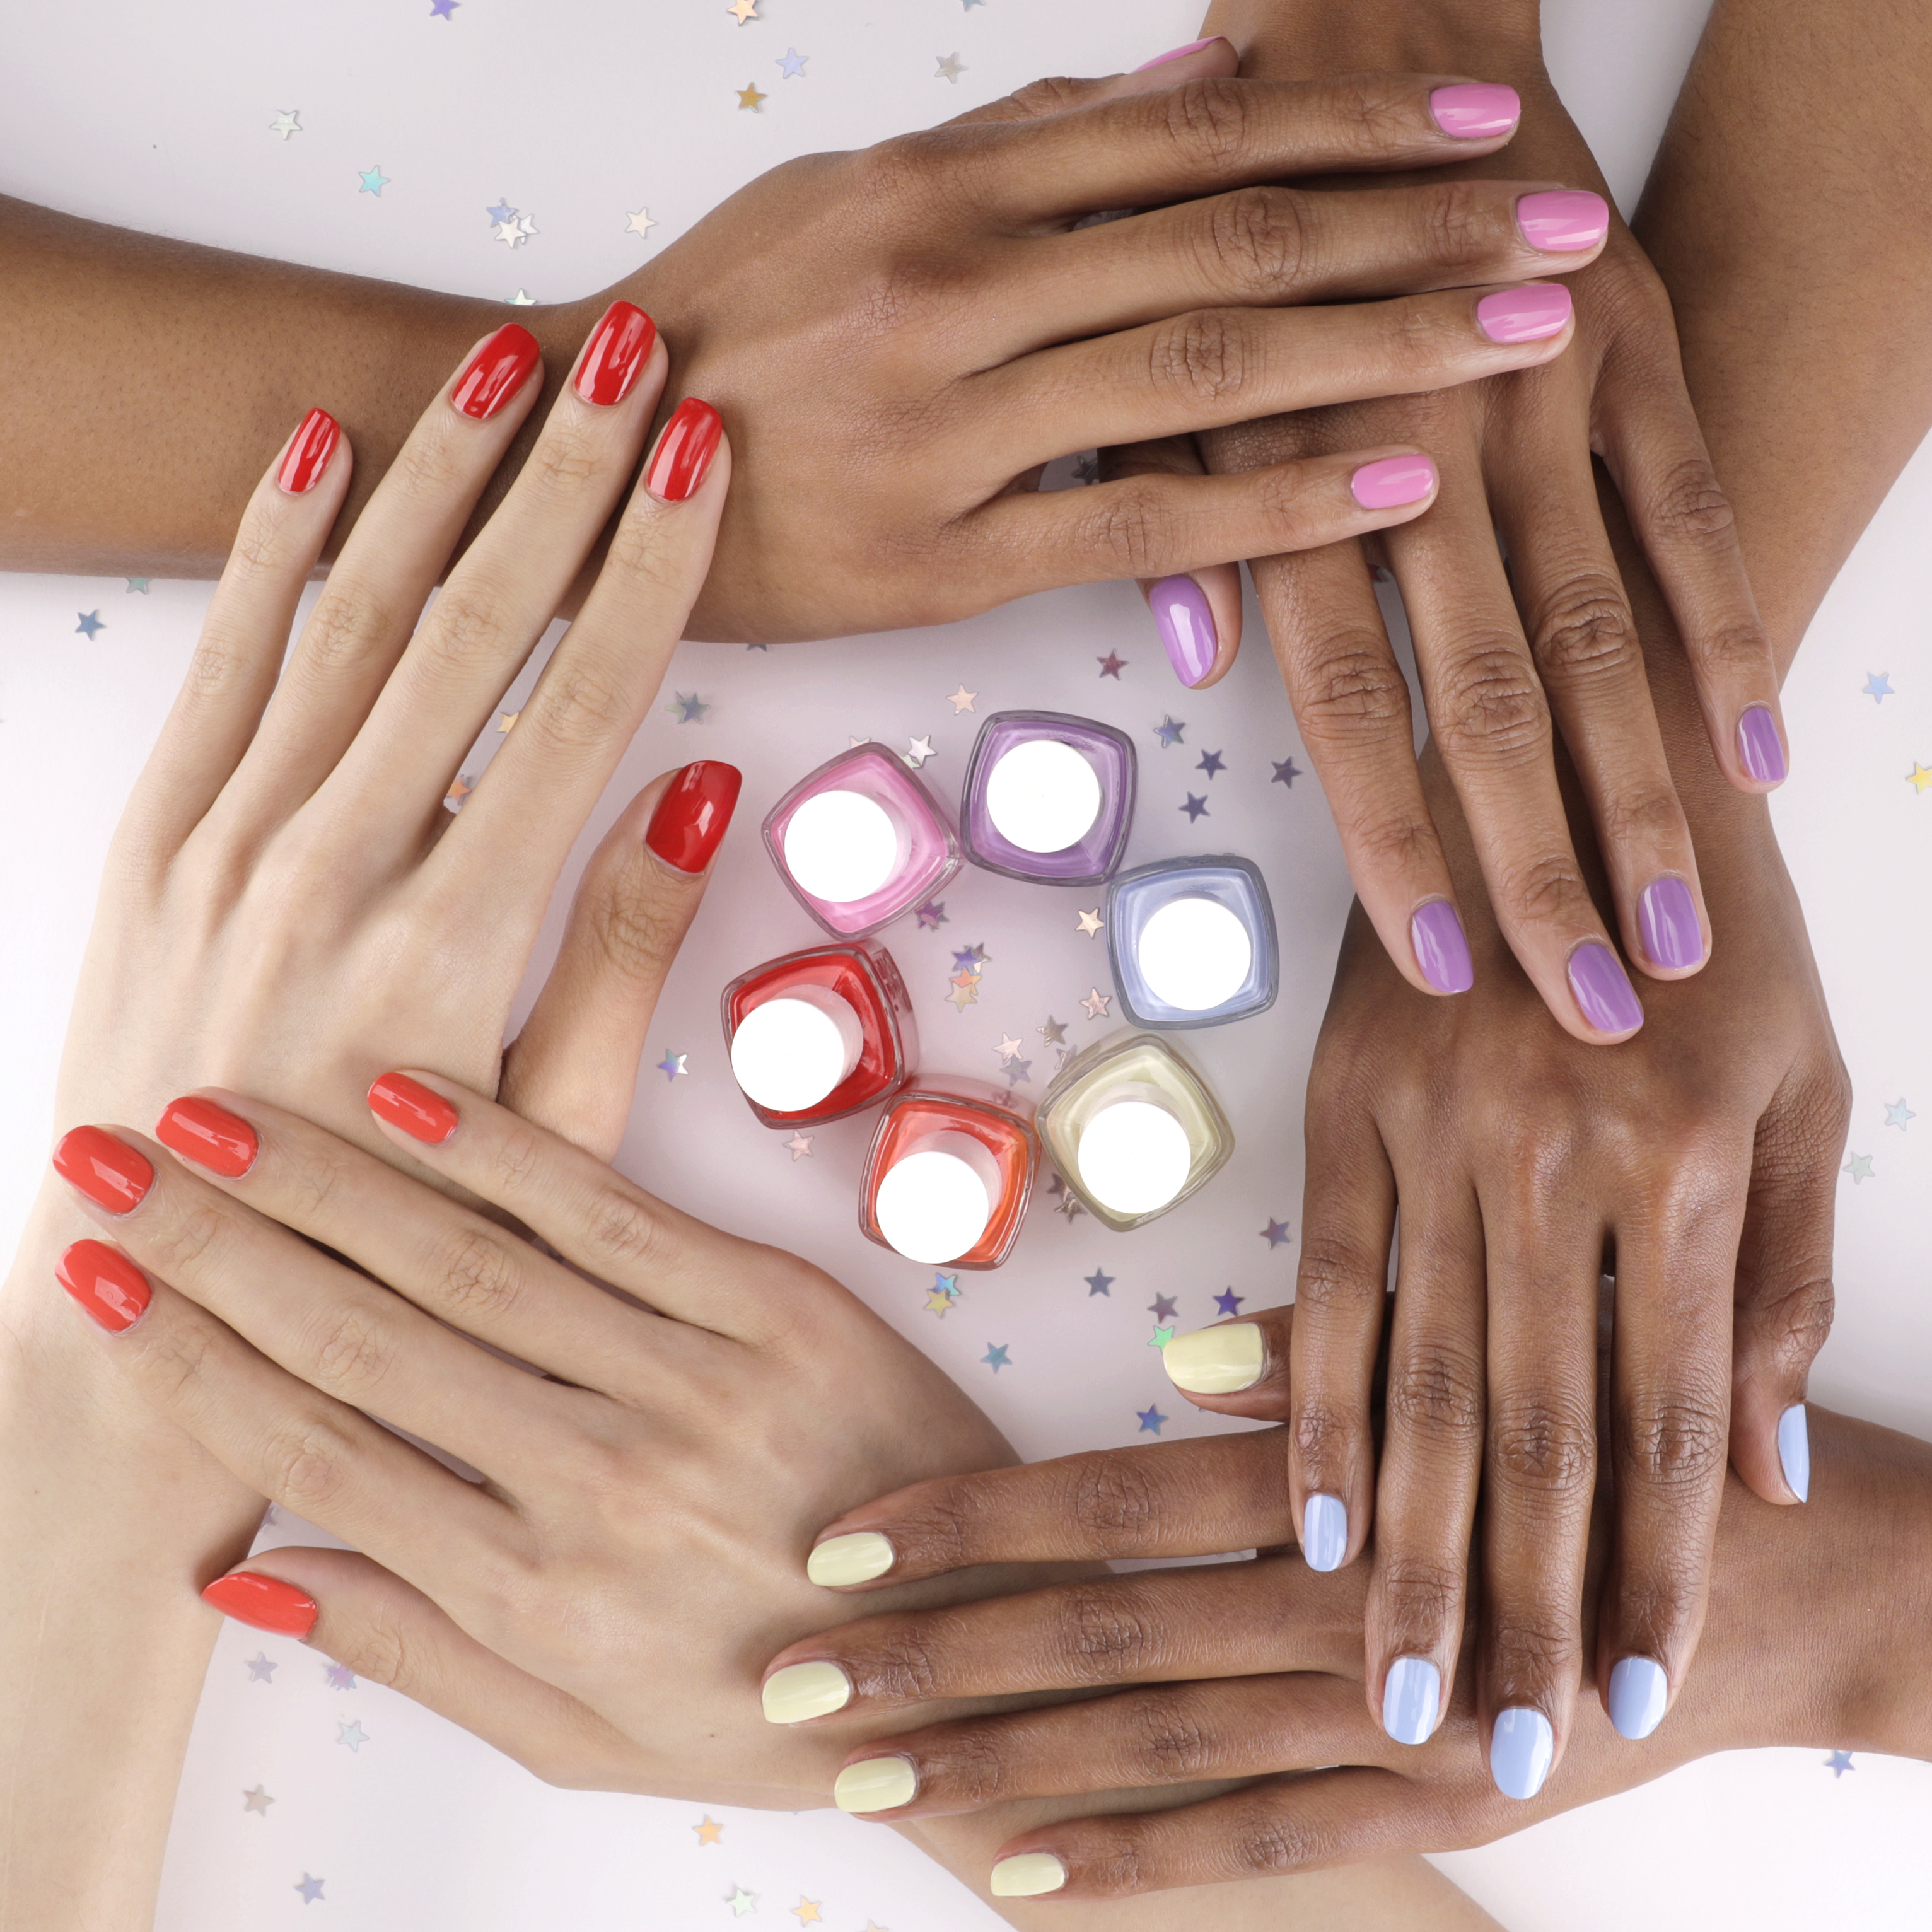 June 1 is National Nail Polish Day.